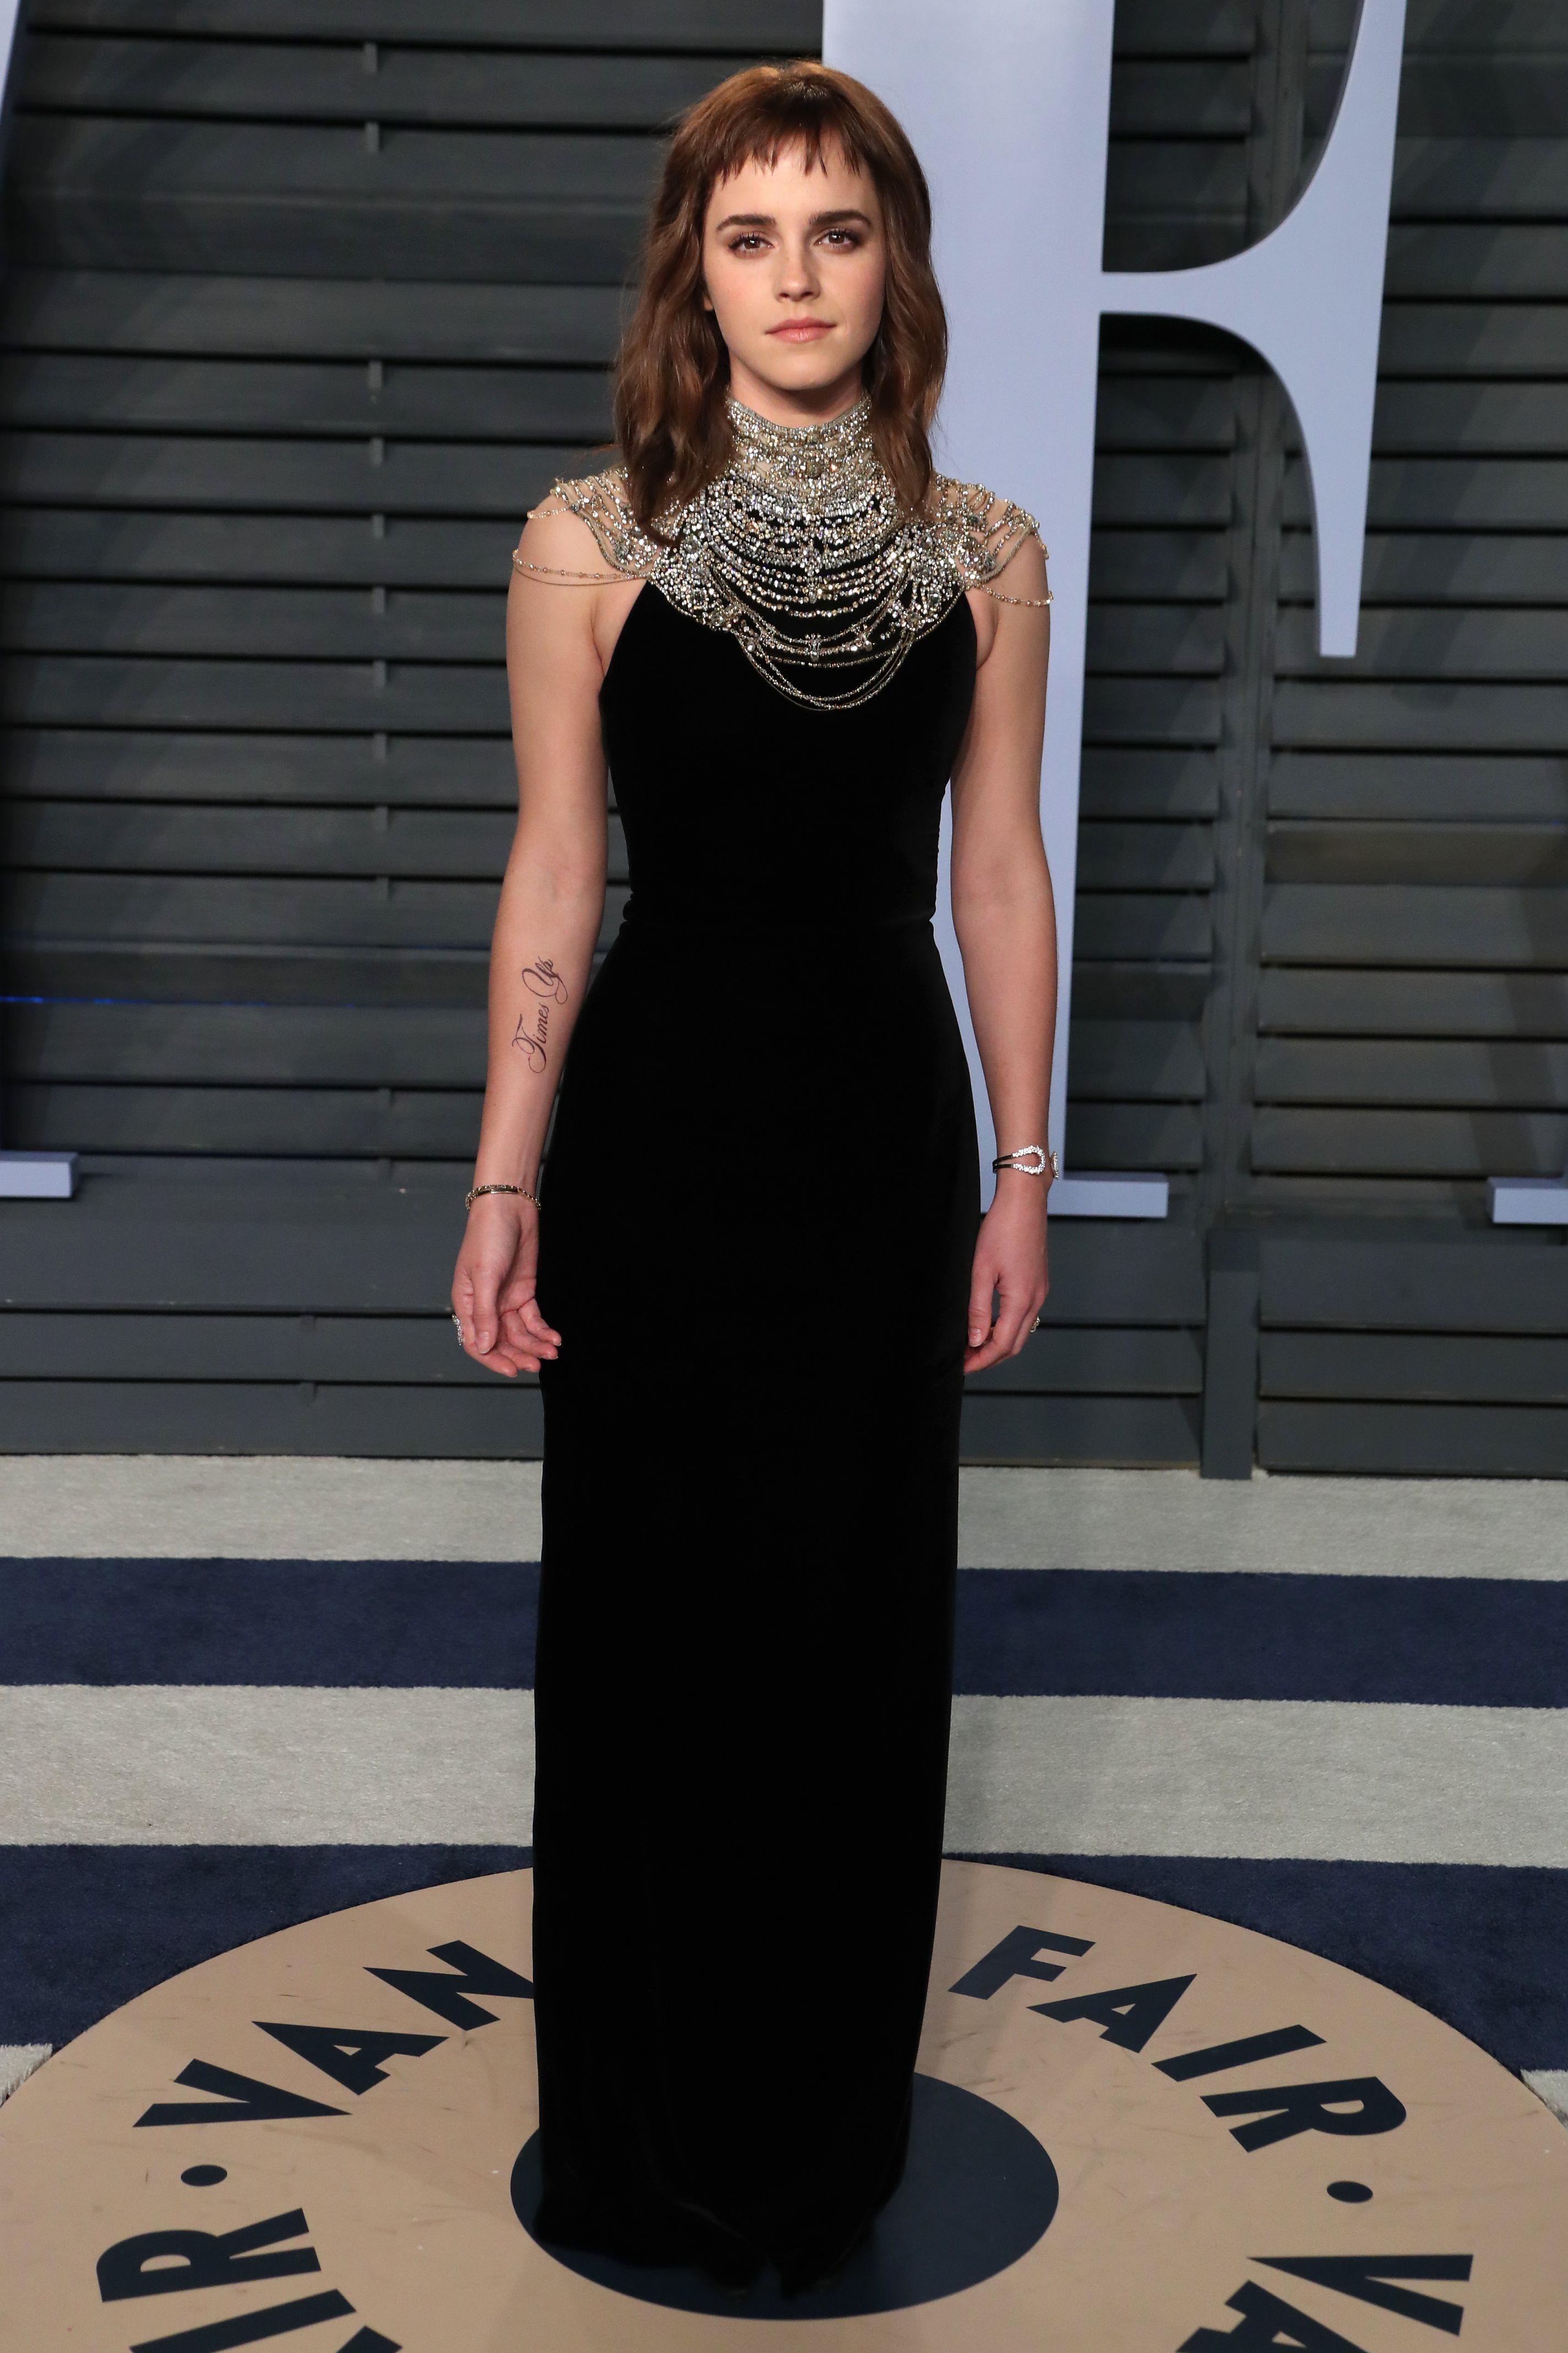 Emma Watson wears Ralph Lauren to the Vanity Fair Oscar Party in Beverly Hills on March 4, 2018.